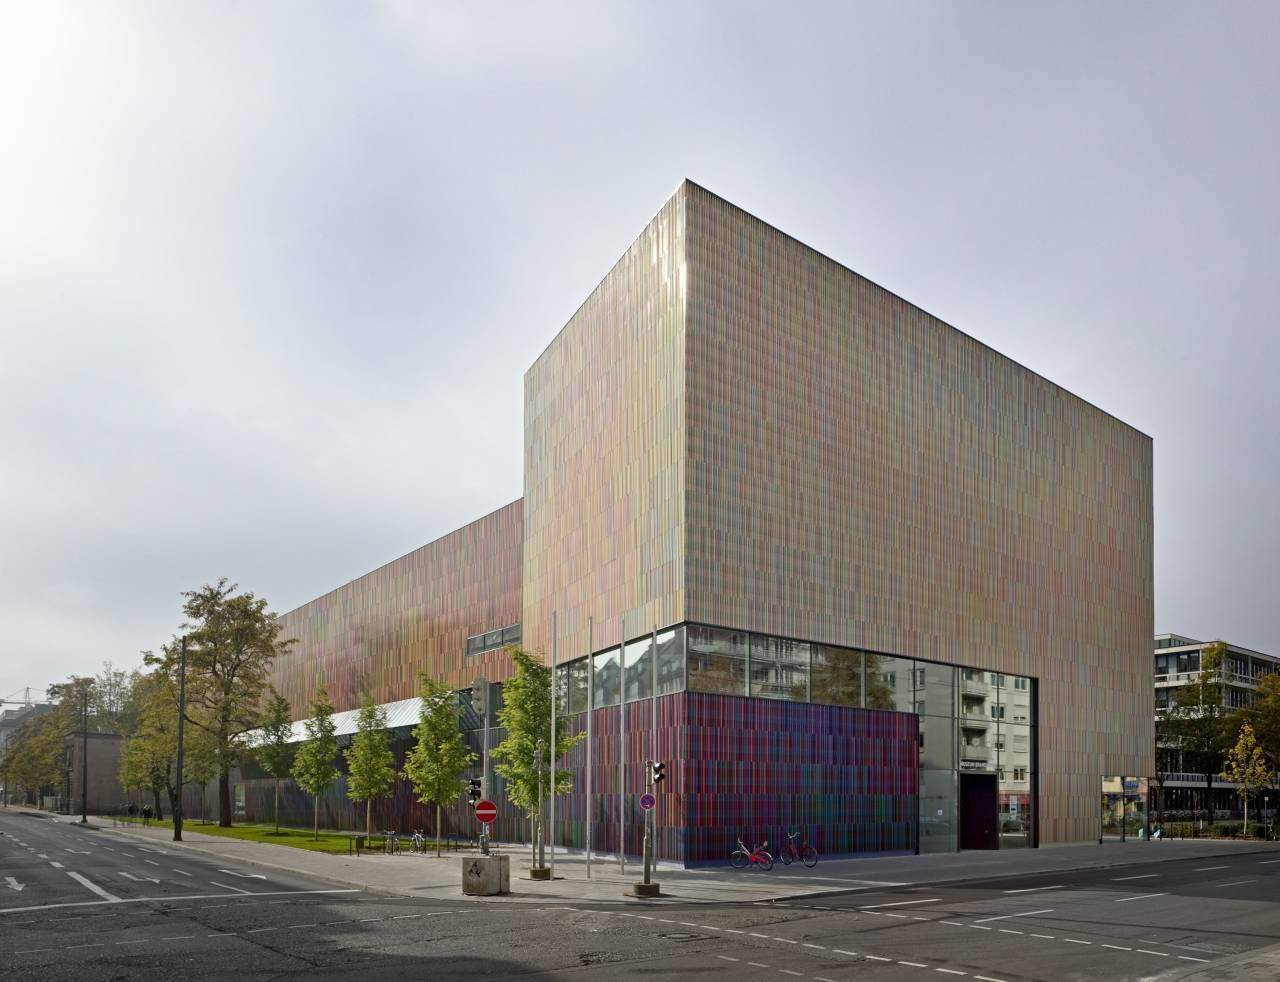 Museu Brandhorst, Munique, Alemanha